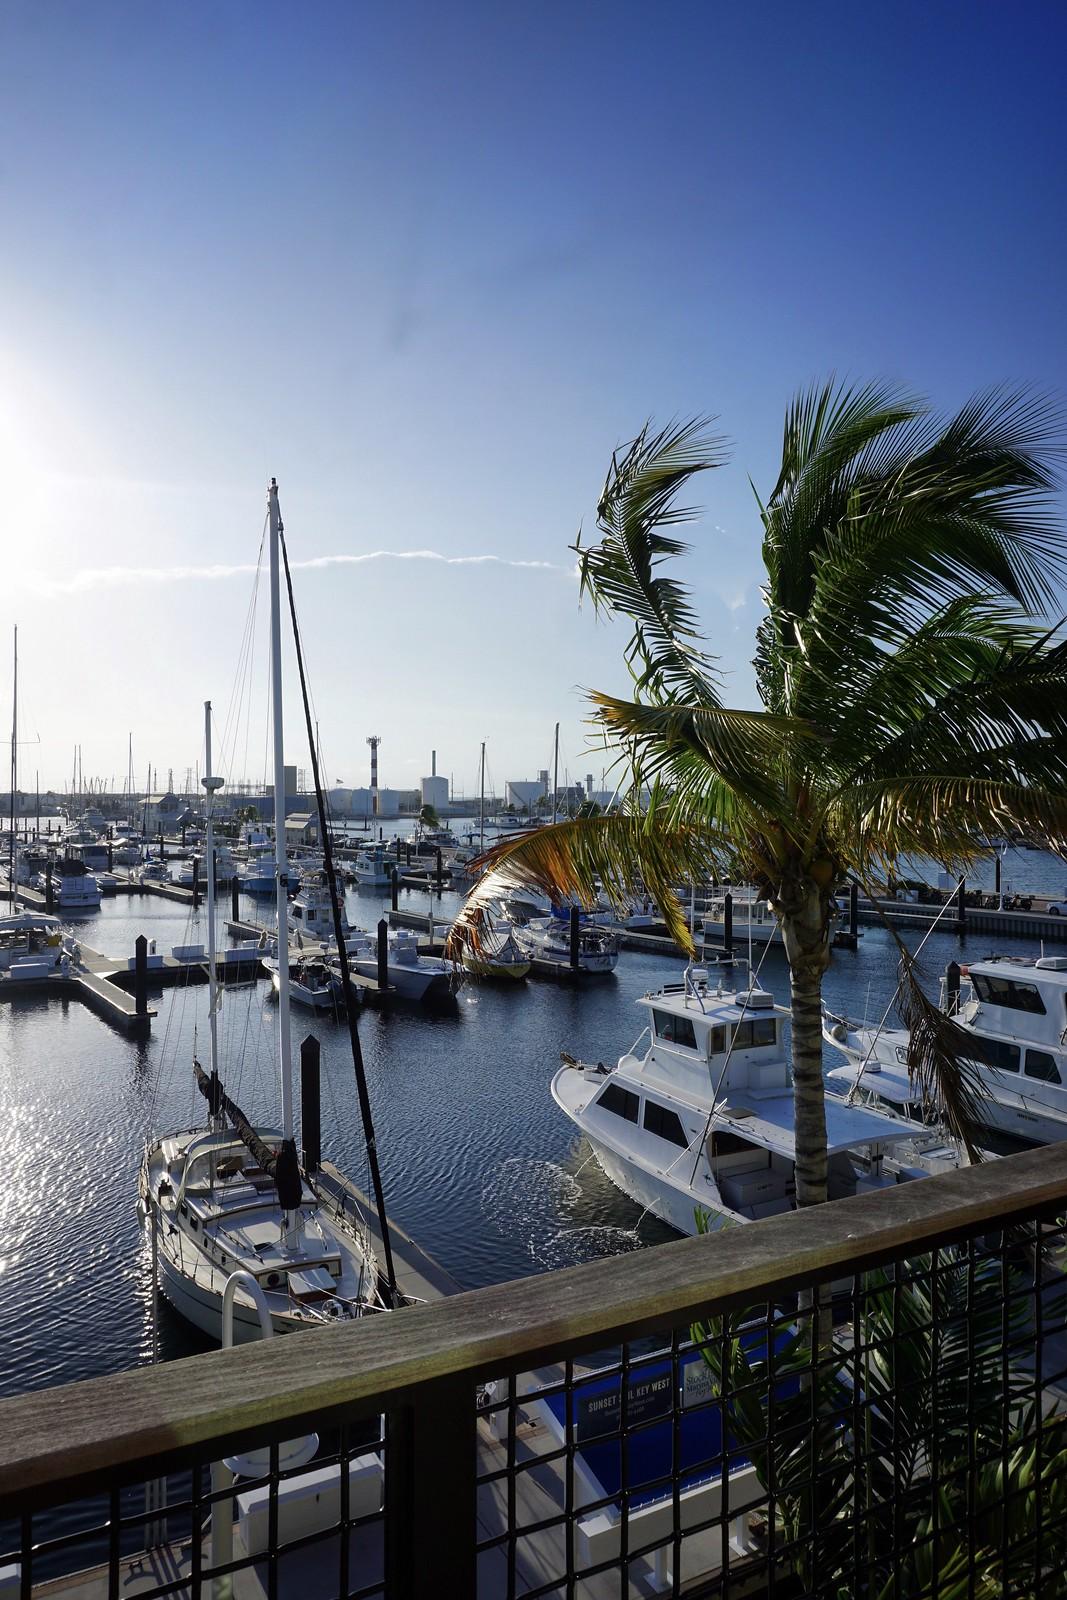 stock-island-marina-ultimate-road-trip-5-days-florida-keys-itinerary-what-to-do-key-west-key-largo-islamorada-marathon-miami-vacation-guide